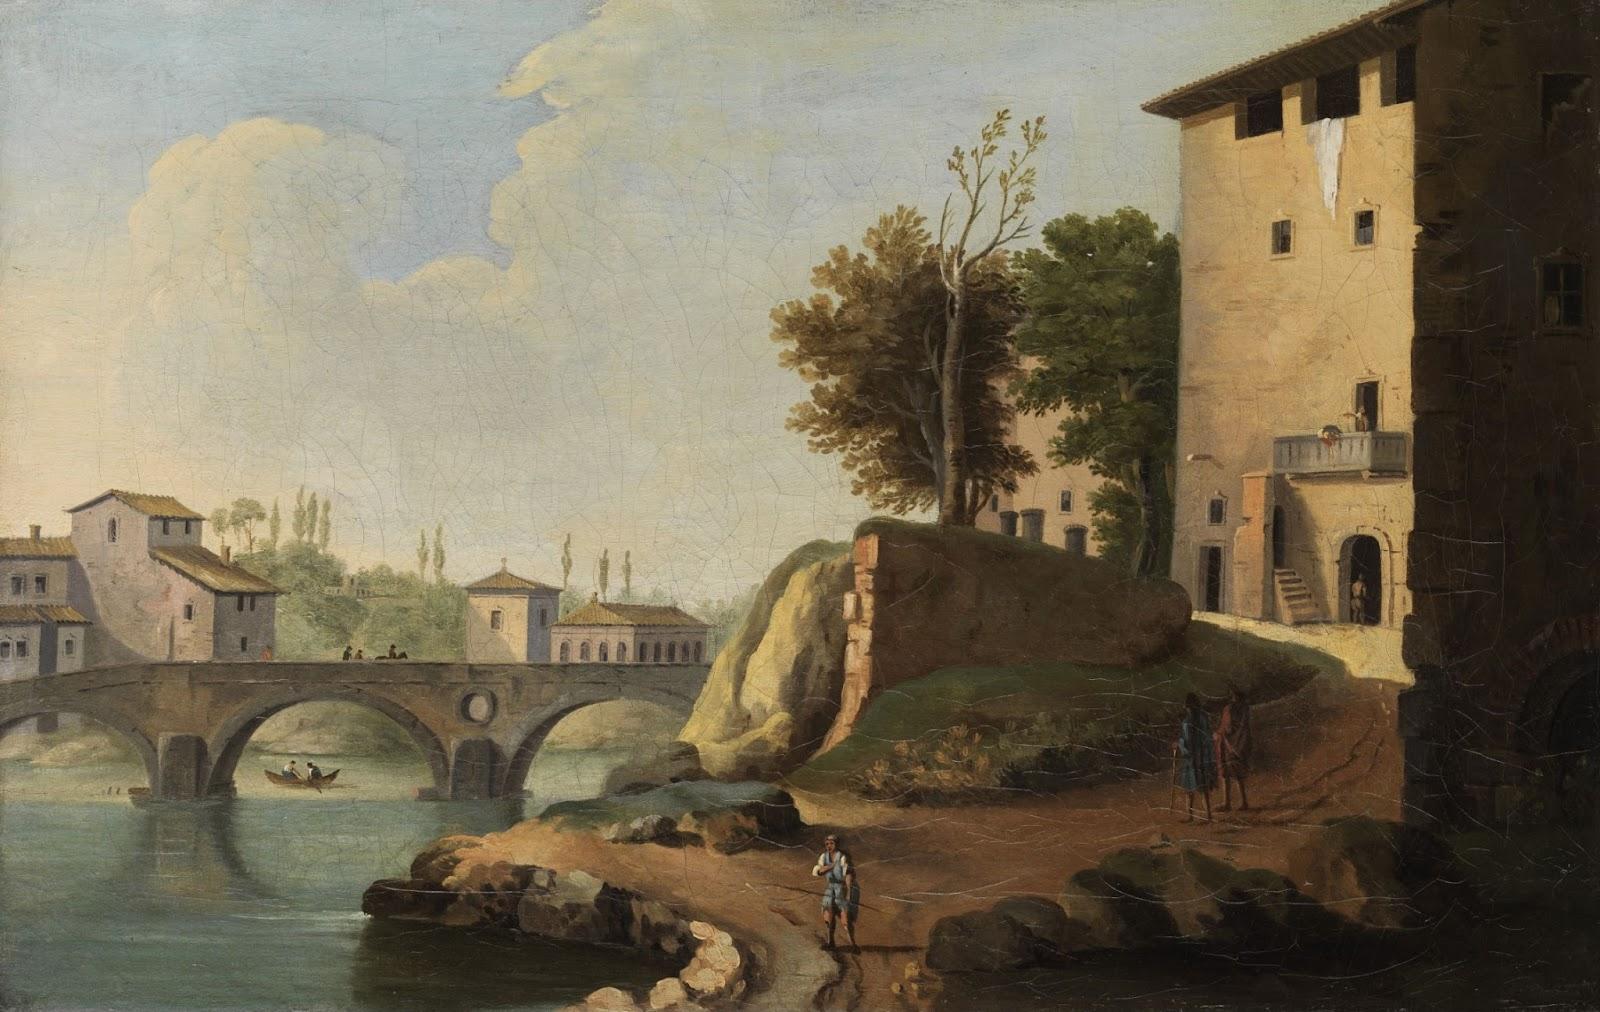 3 Paolo_anesi_painting1 tiber bridge.jpg